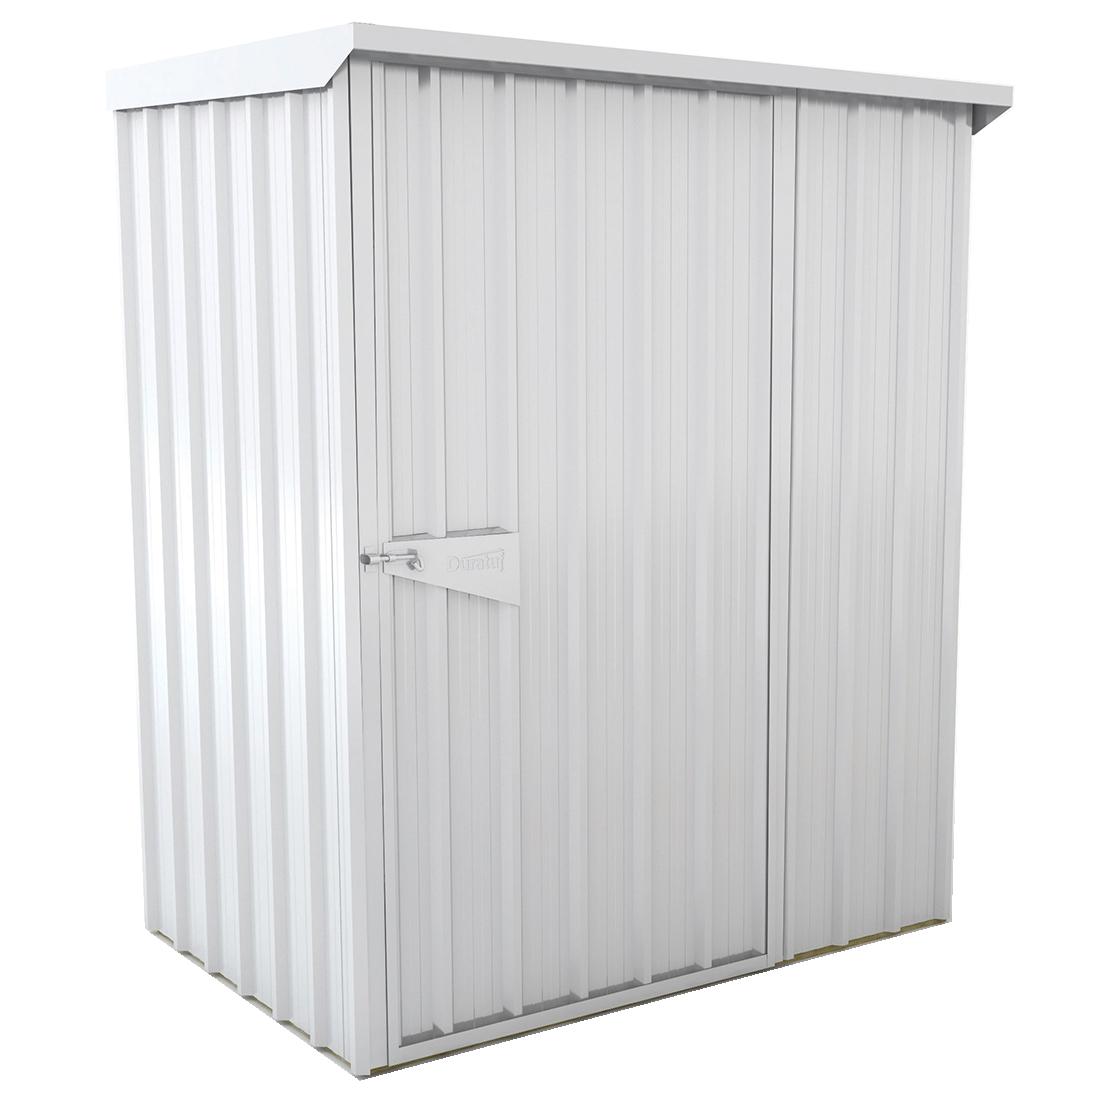 Garrison Zinc Kitset Garden Shed 1.52 x 1.02m